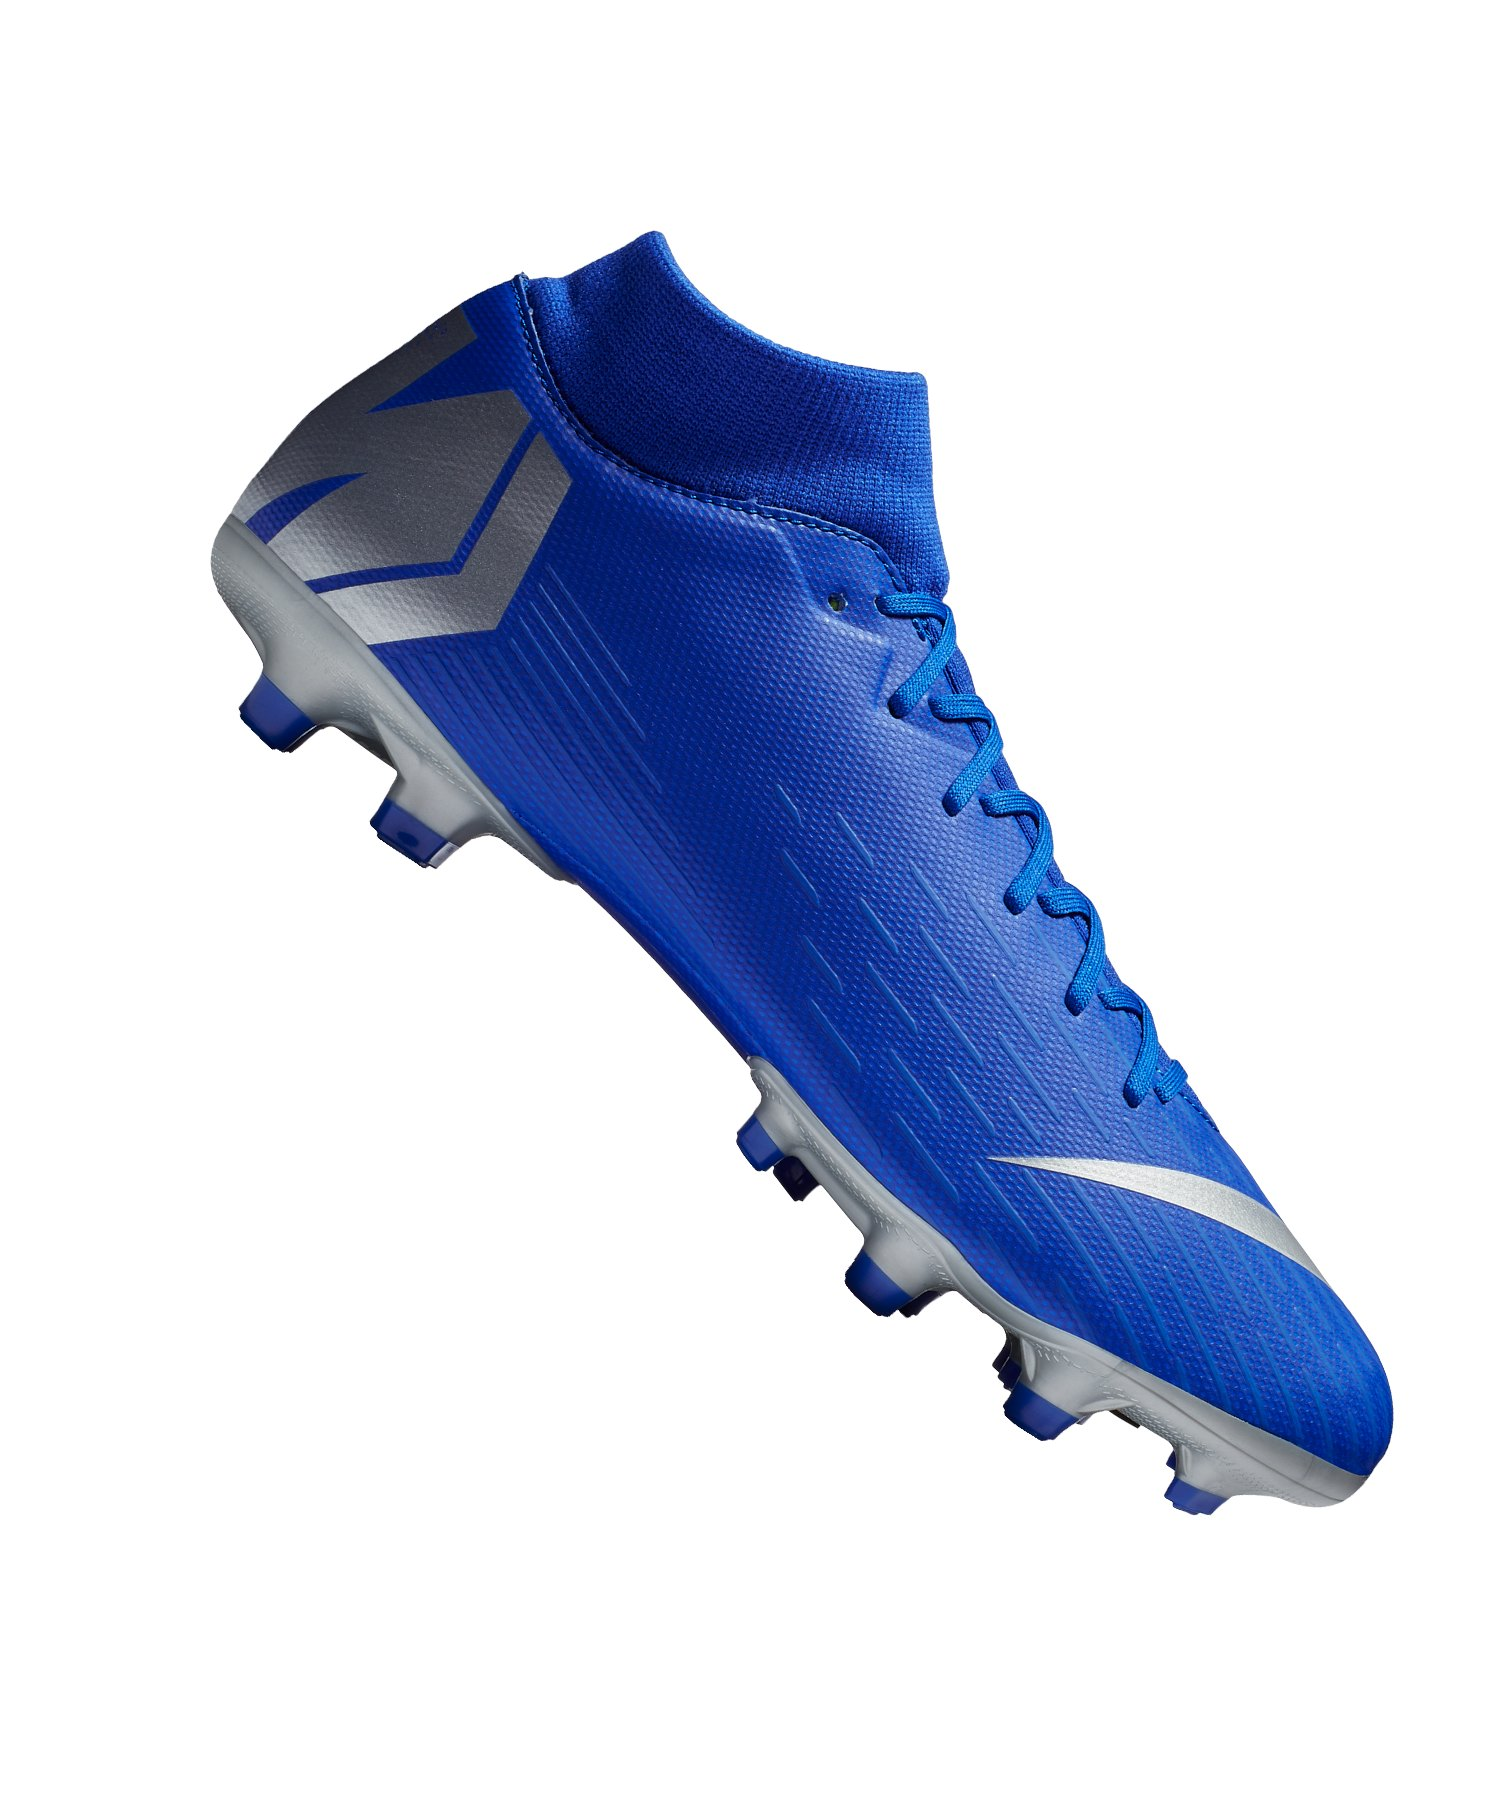 e75f2978370b54 Nike Mercurial Superfly VI Academy MG Blau F400 - blau